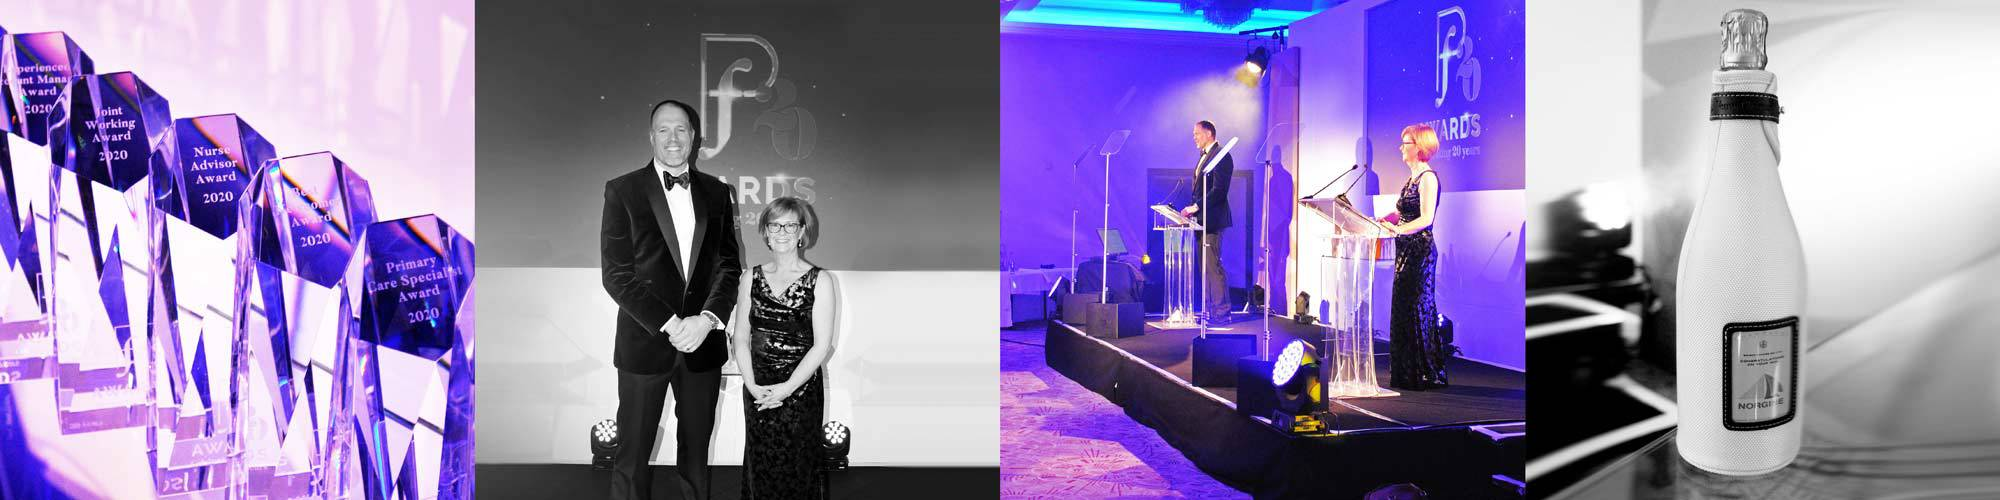 Pf Awards montage image